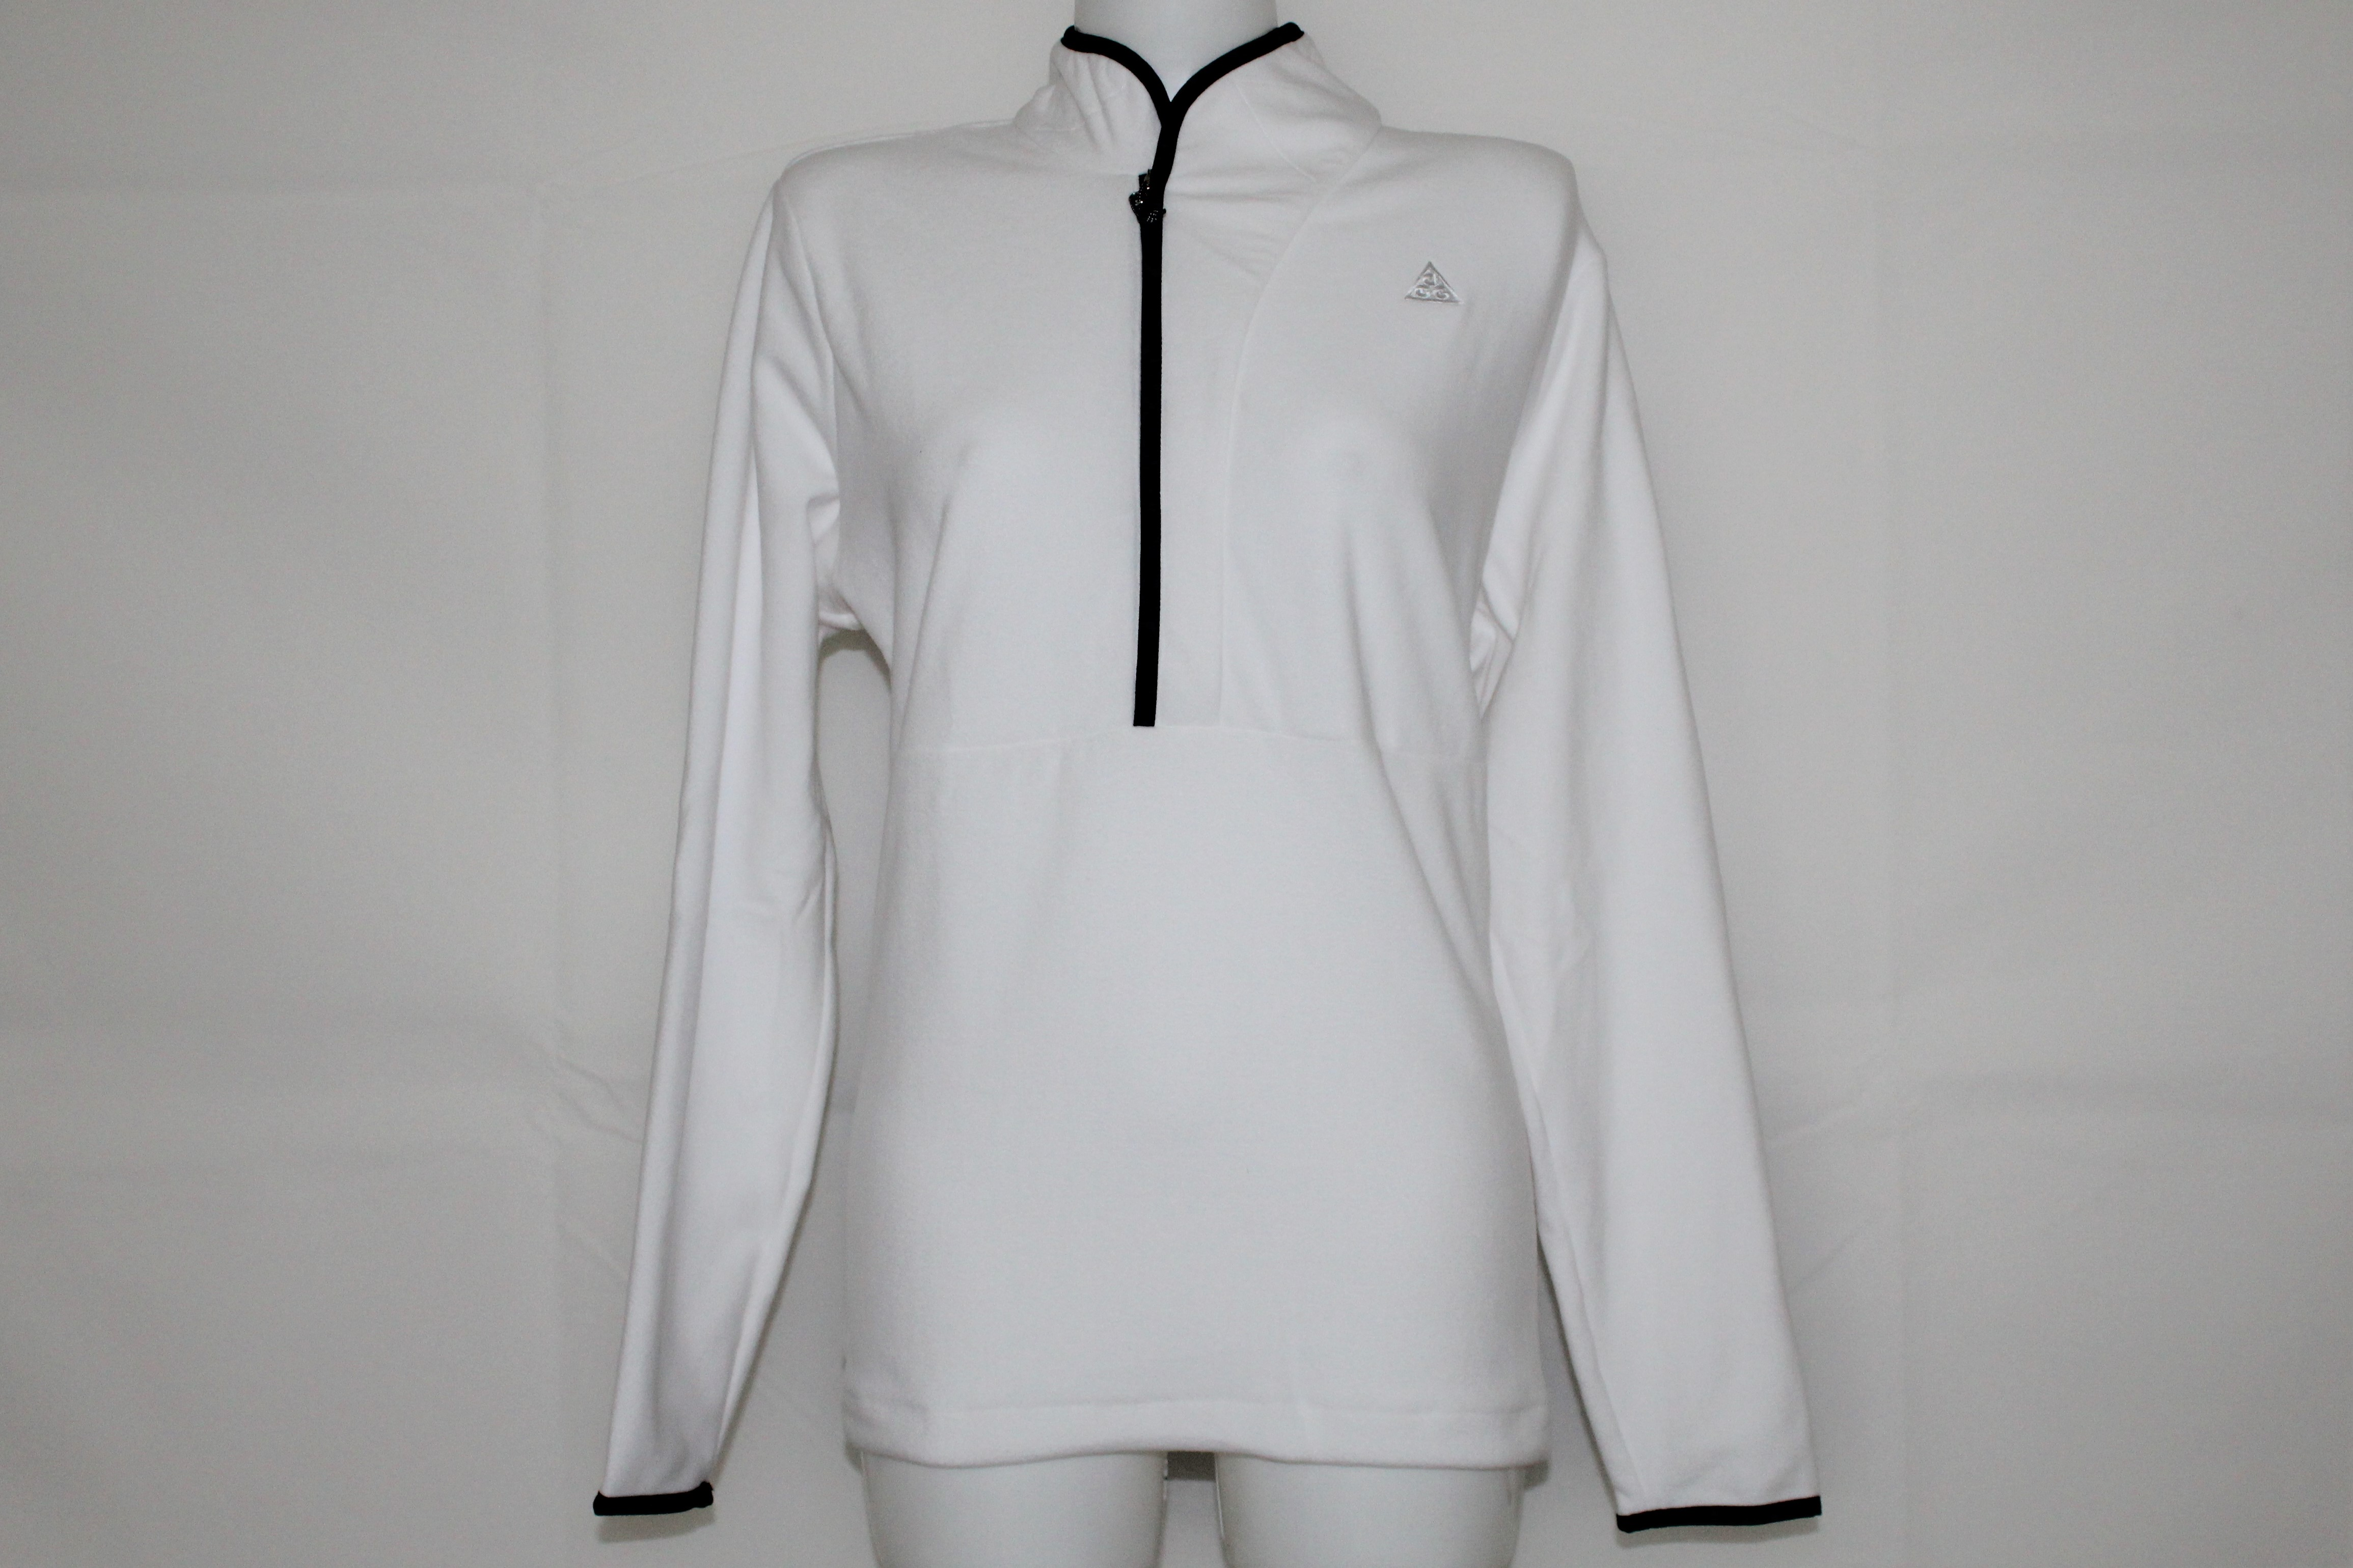 order online shop how to buy Nike Damen ACG Fleece Sweater weiß-schwarz Gr. XL